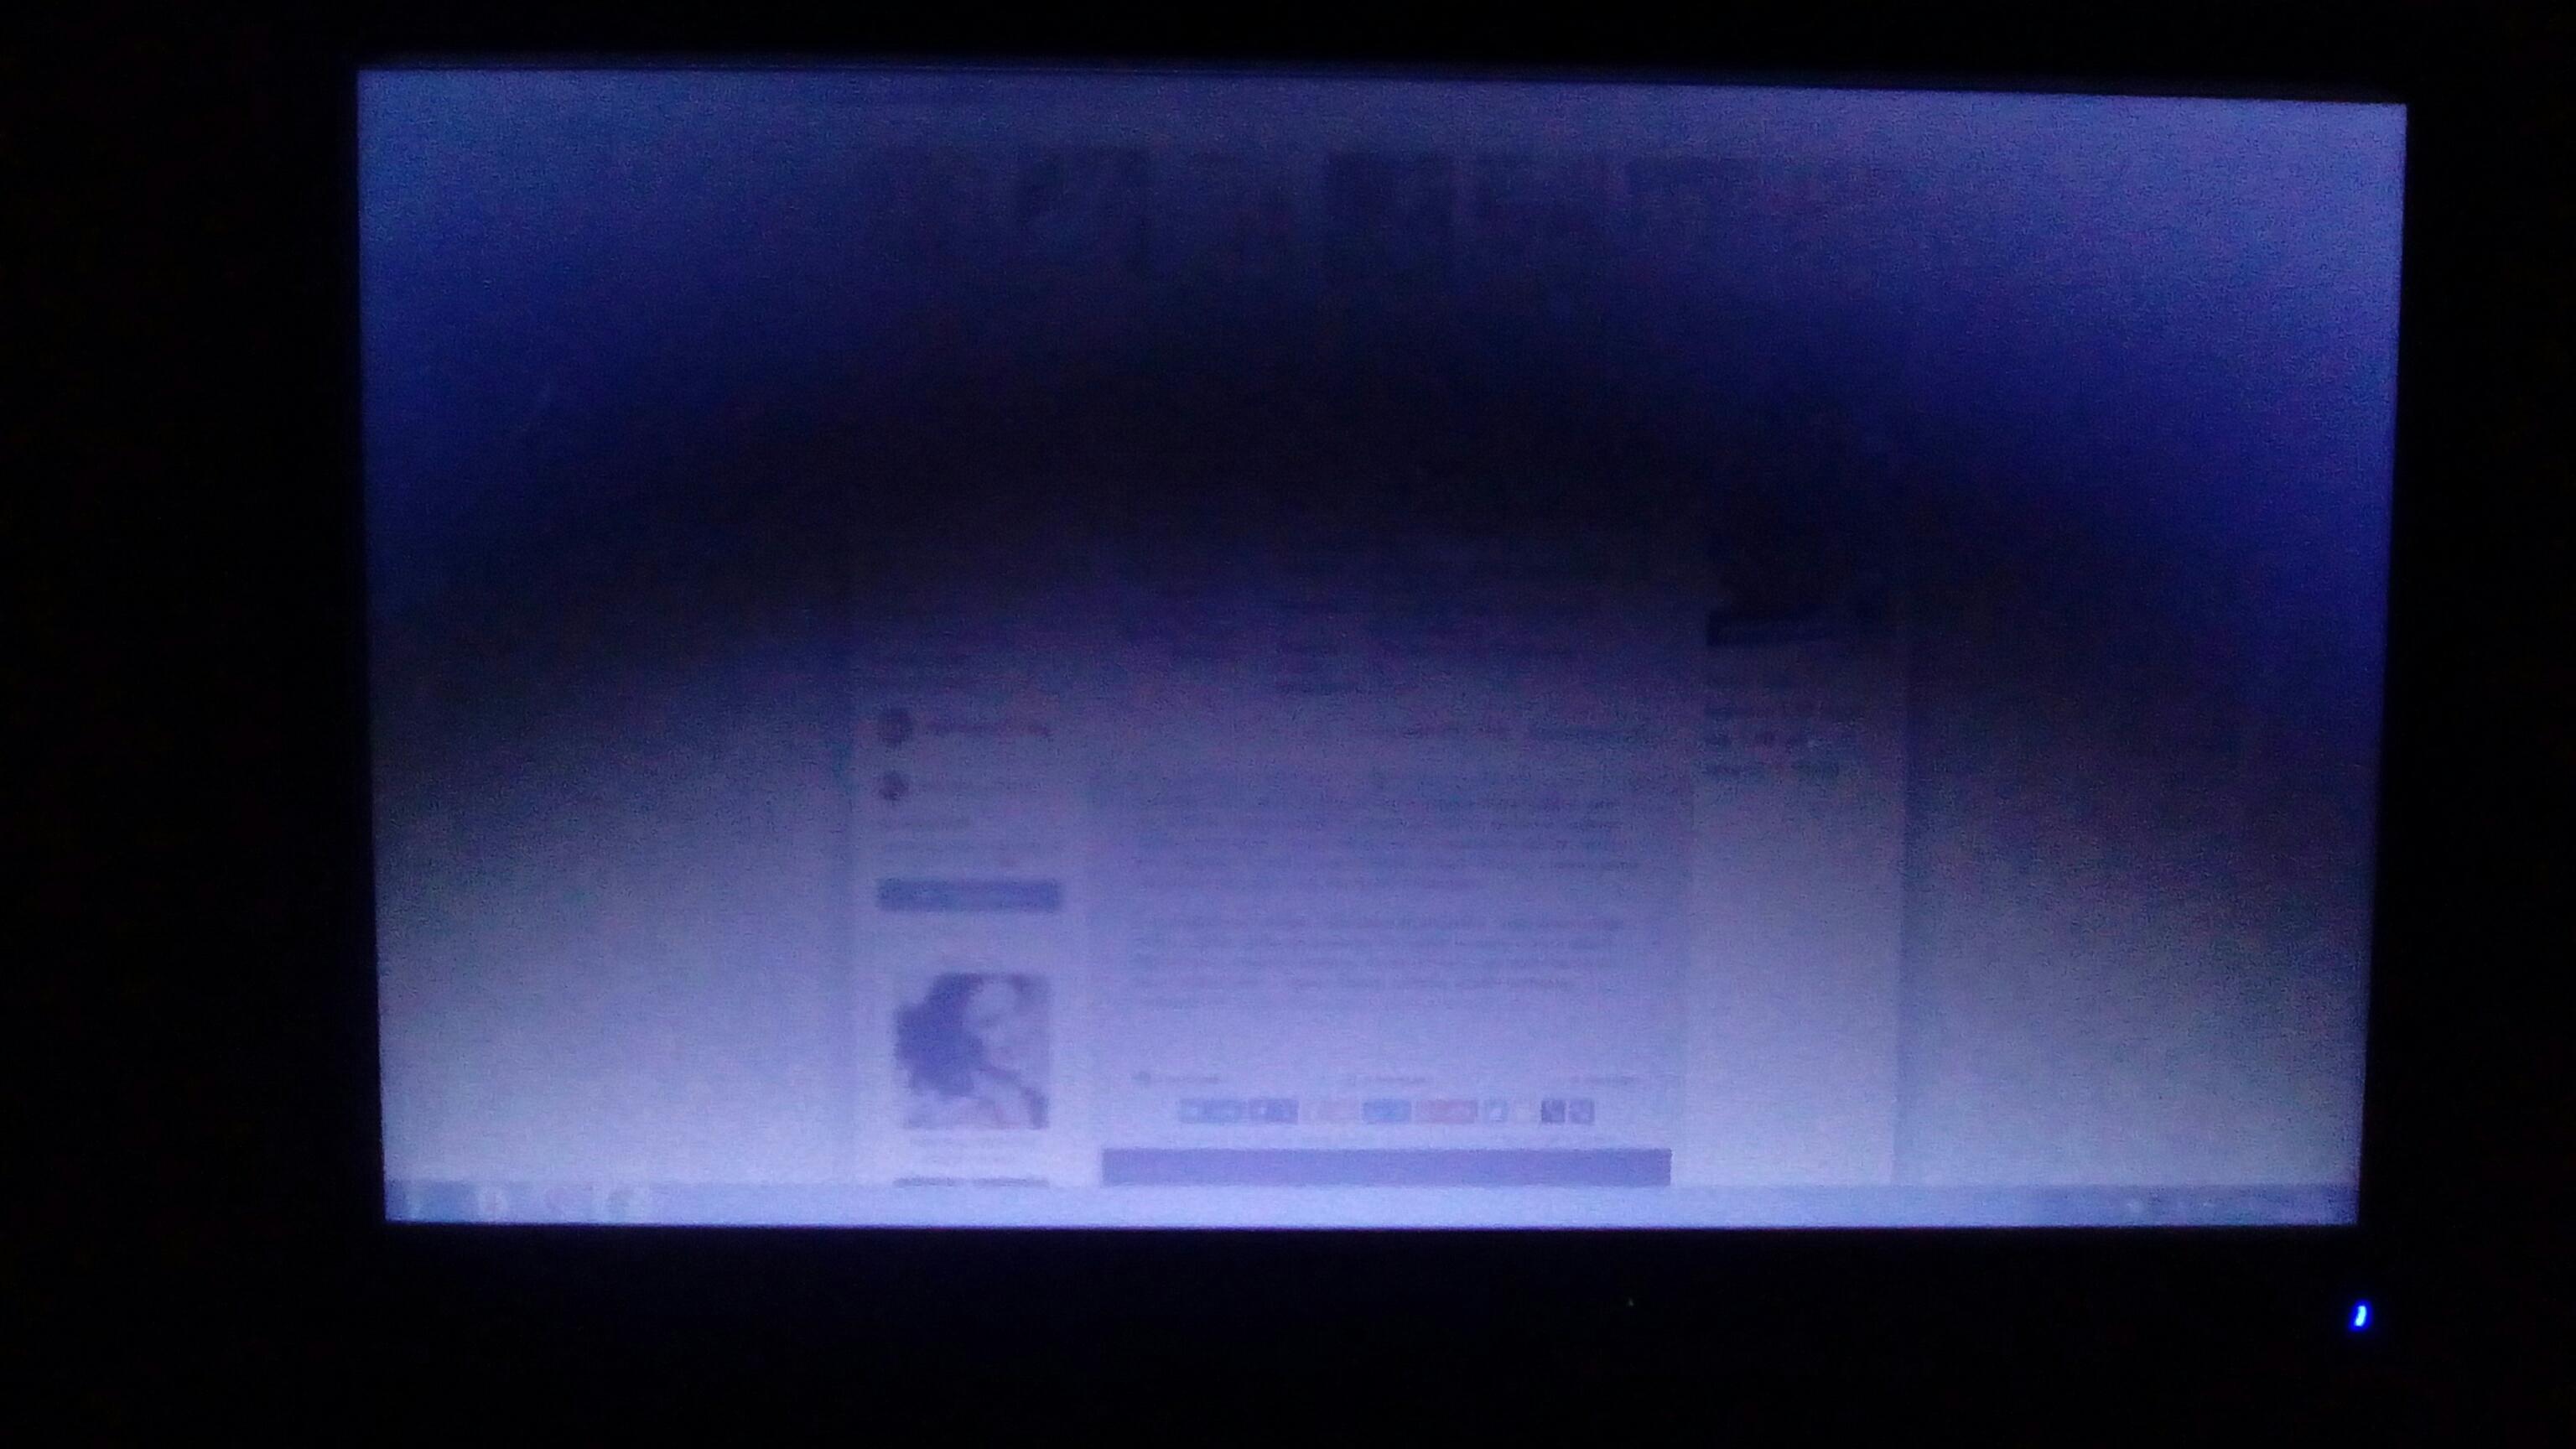 Вылезает порно на экране